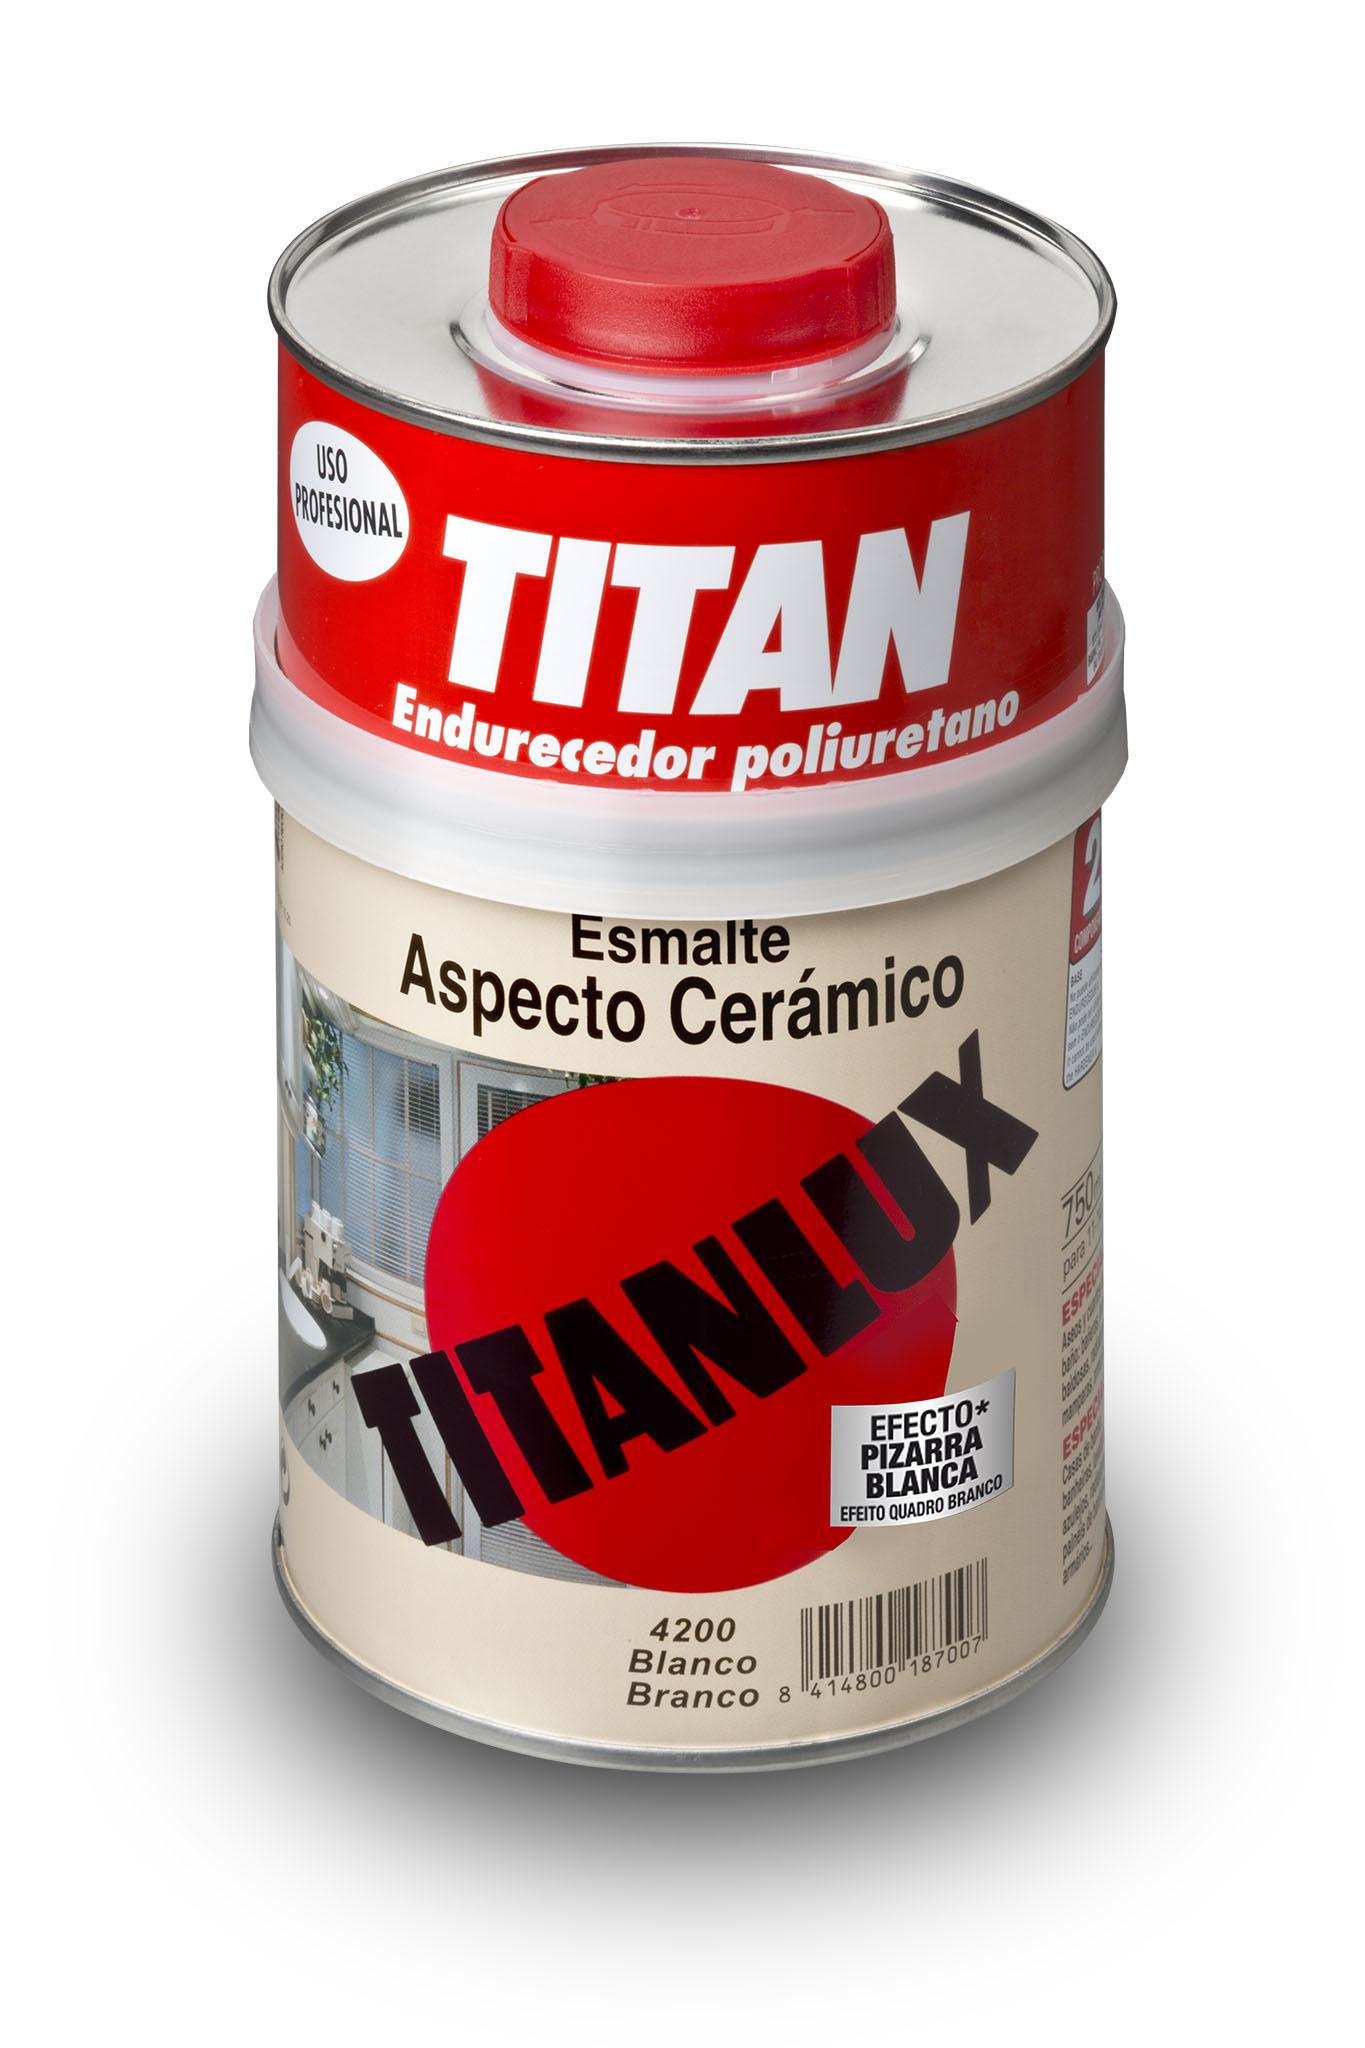 ESMALTE TITANLUX ASPECTO CERÁMICO.